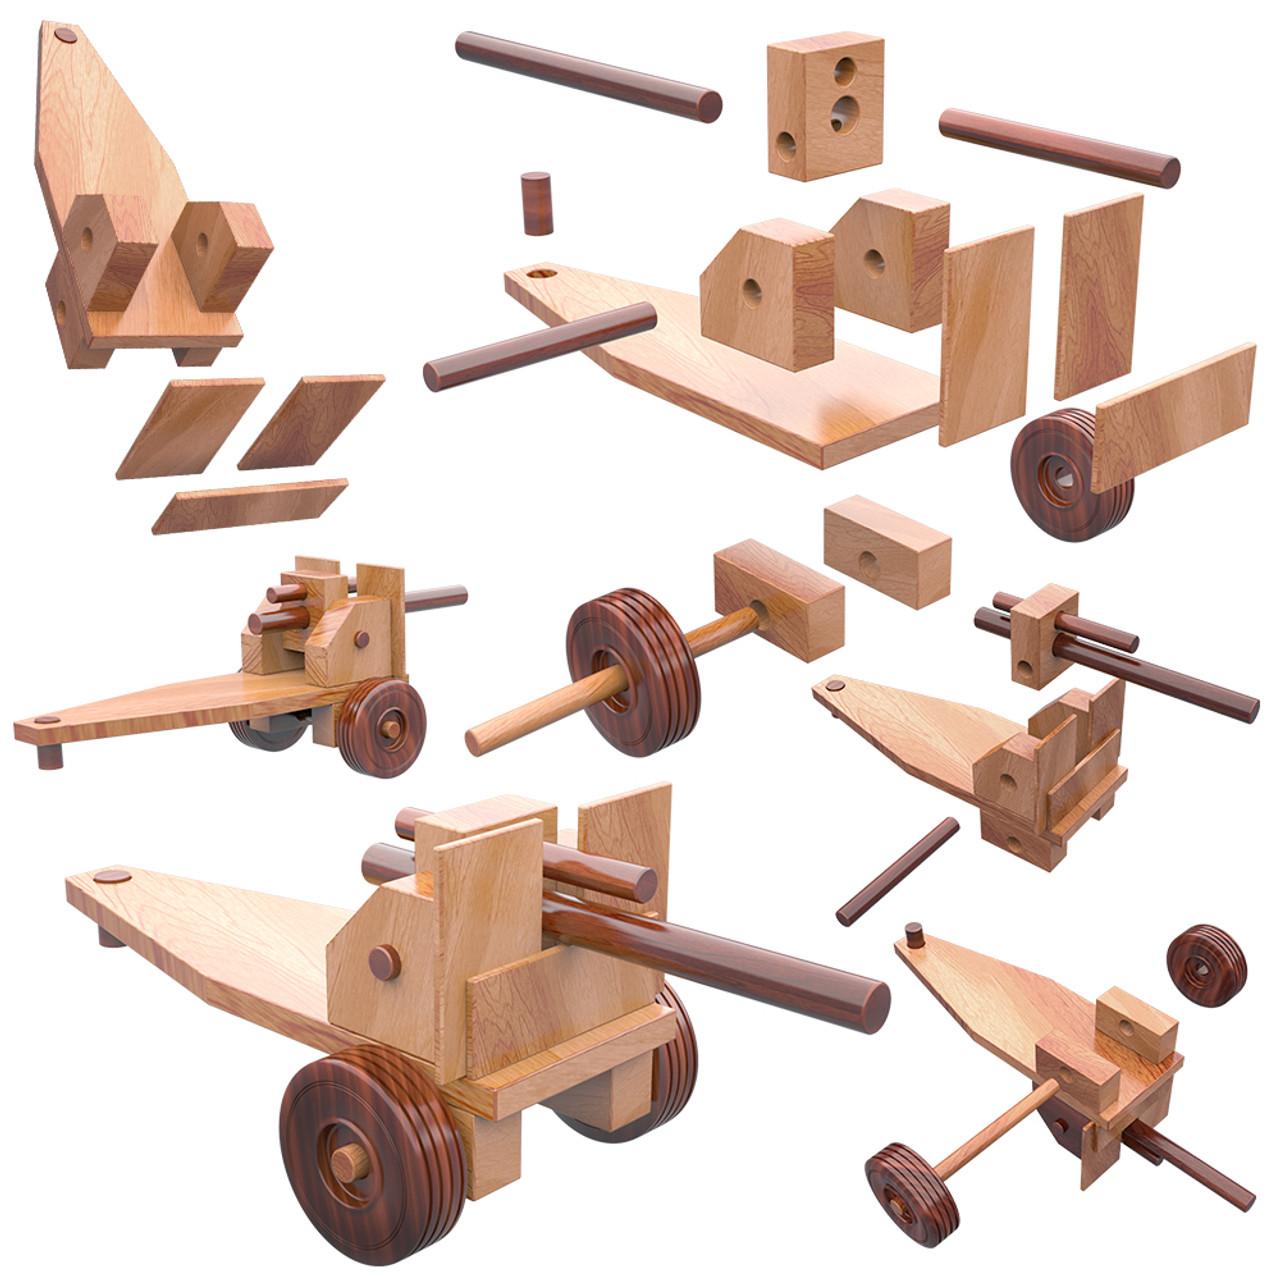 super reallywood vietnam howitzer wood toy plans (pdf download)